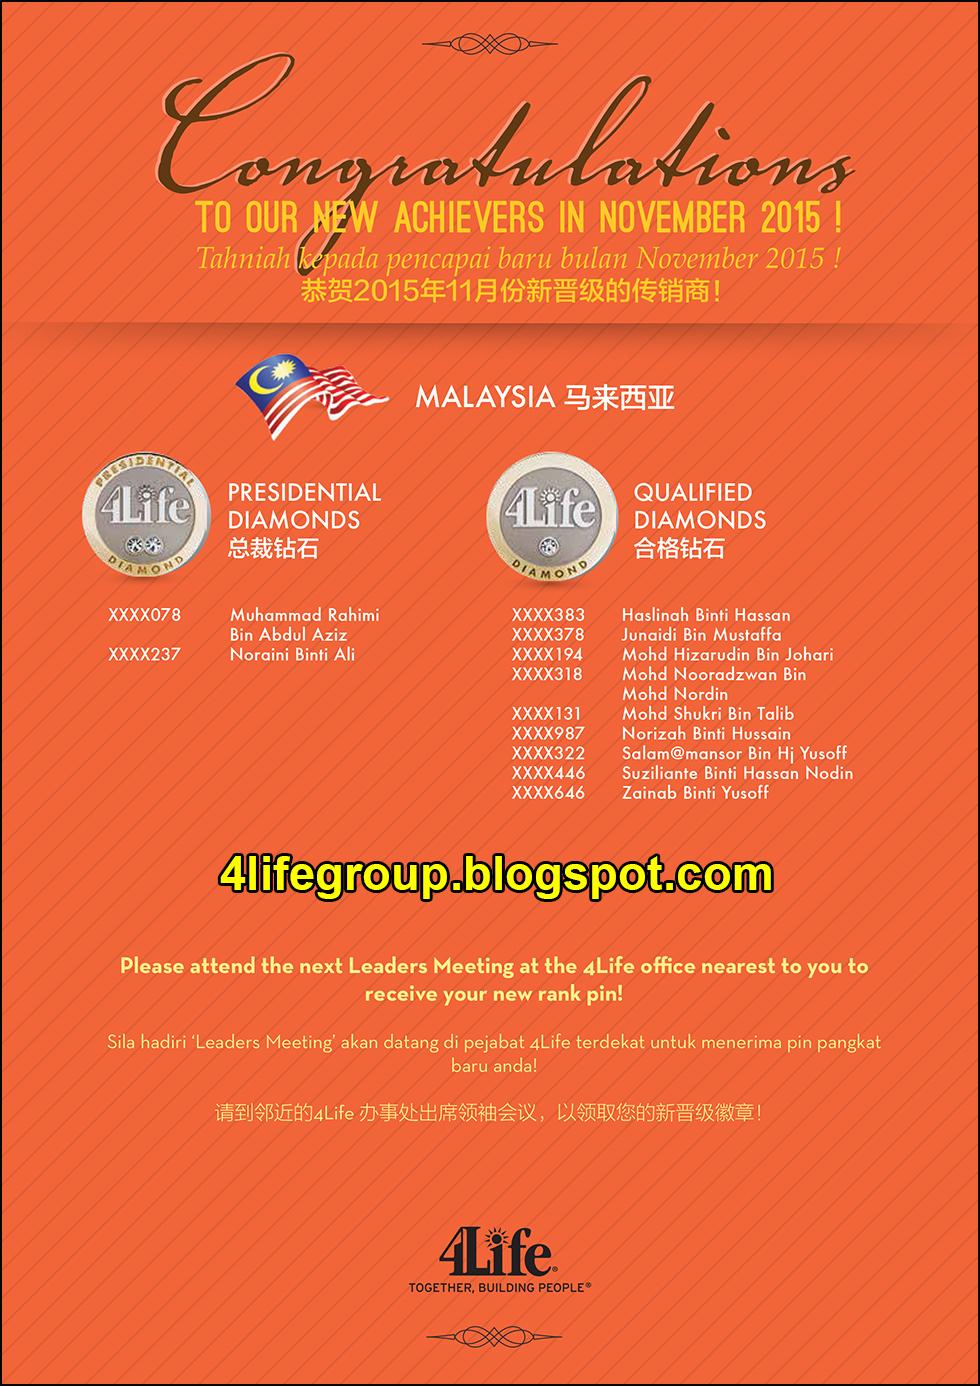 foto Pencapai Pangkat Baru November 2015 4Life Malaysia